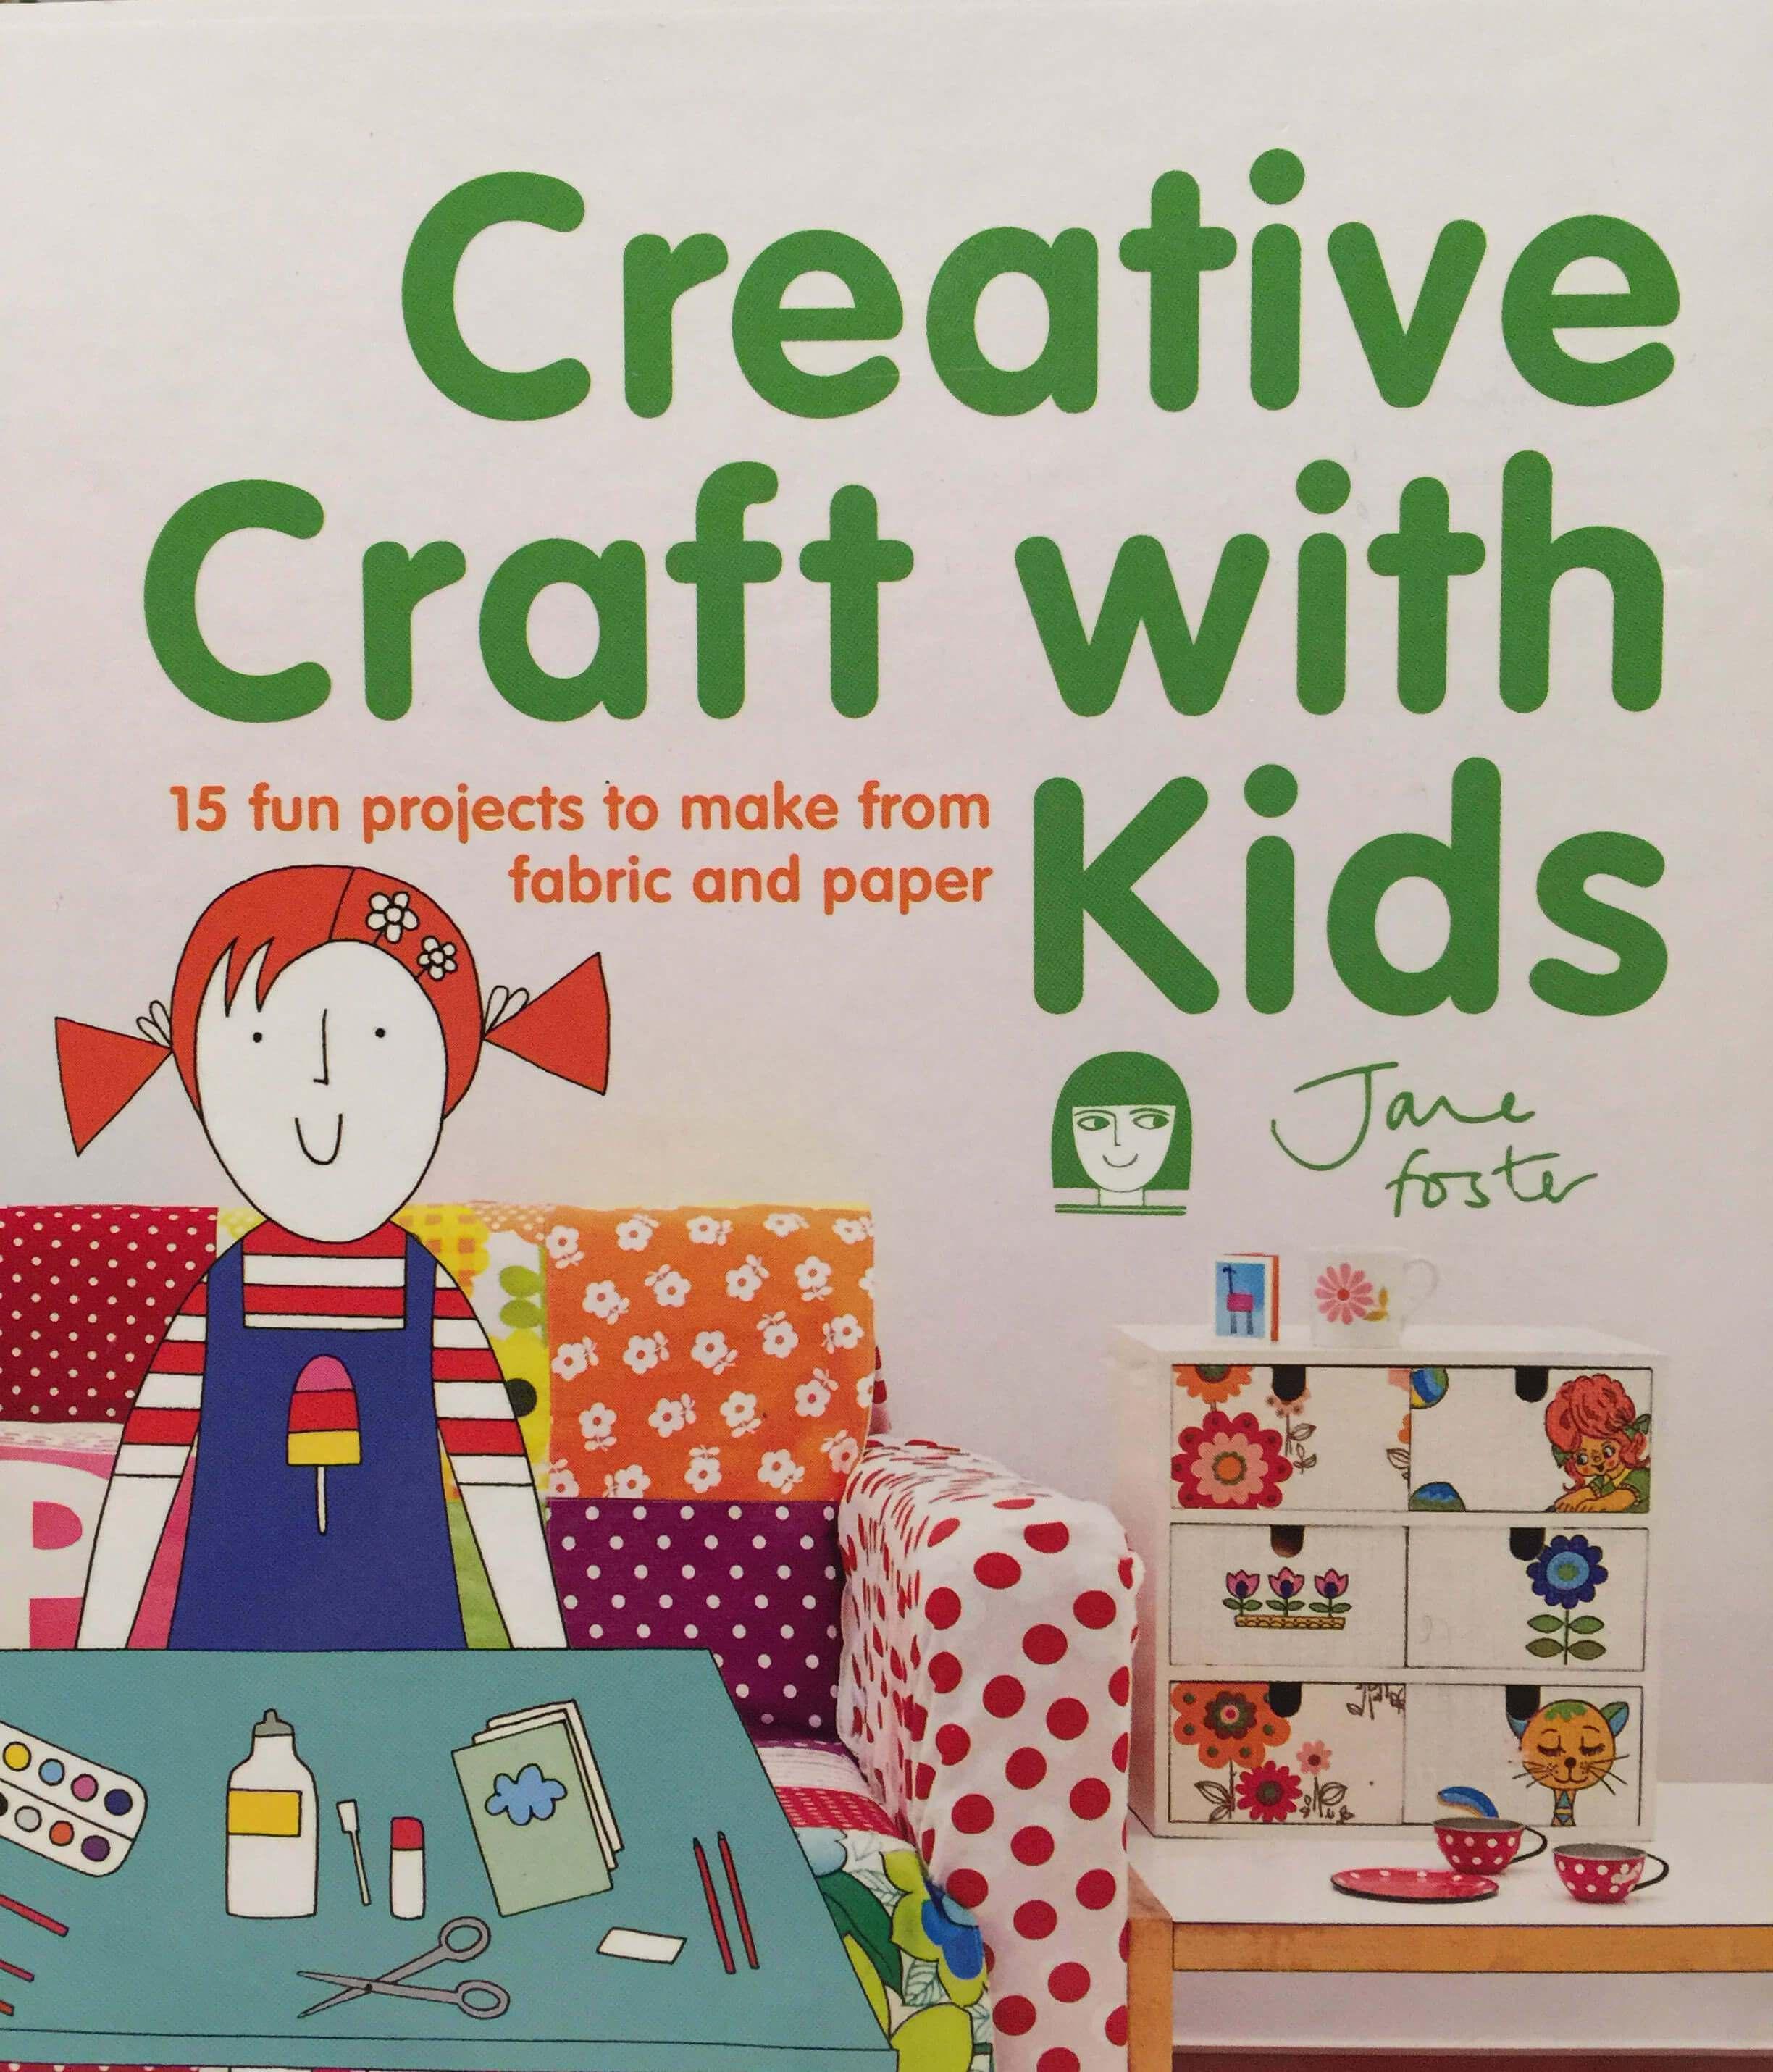 creative craft with kids jane foster